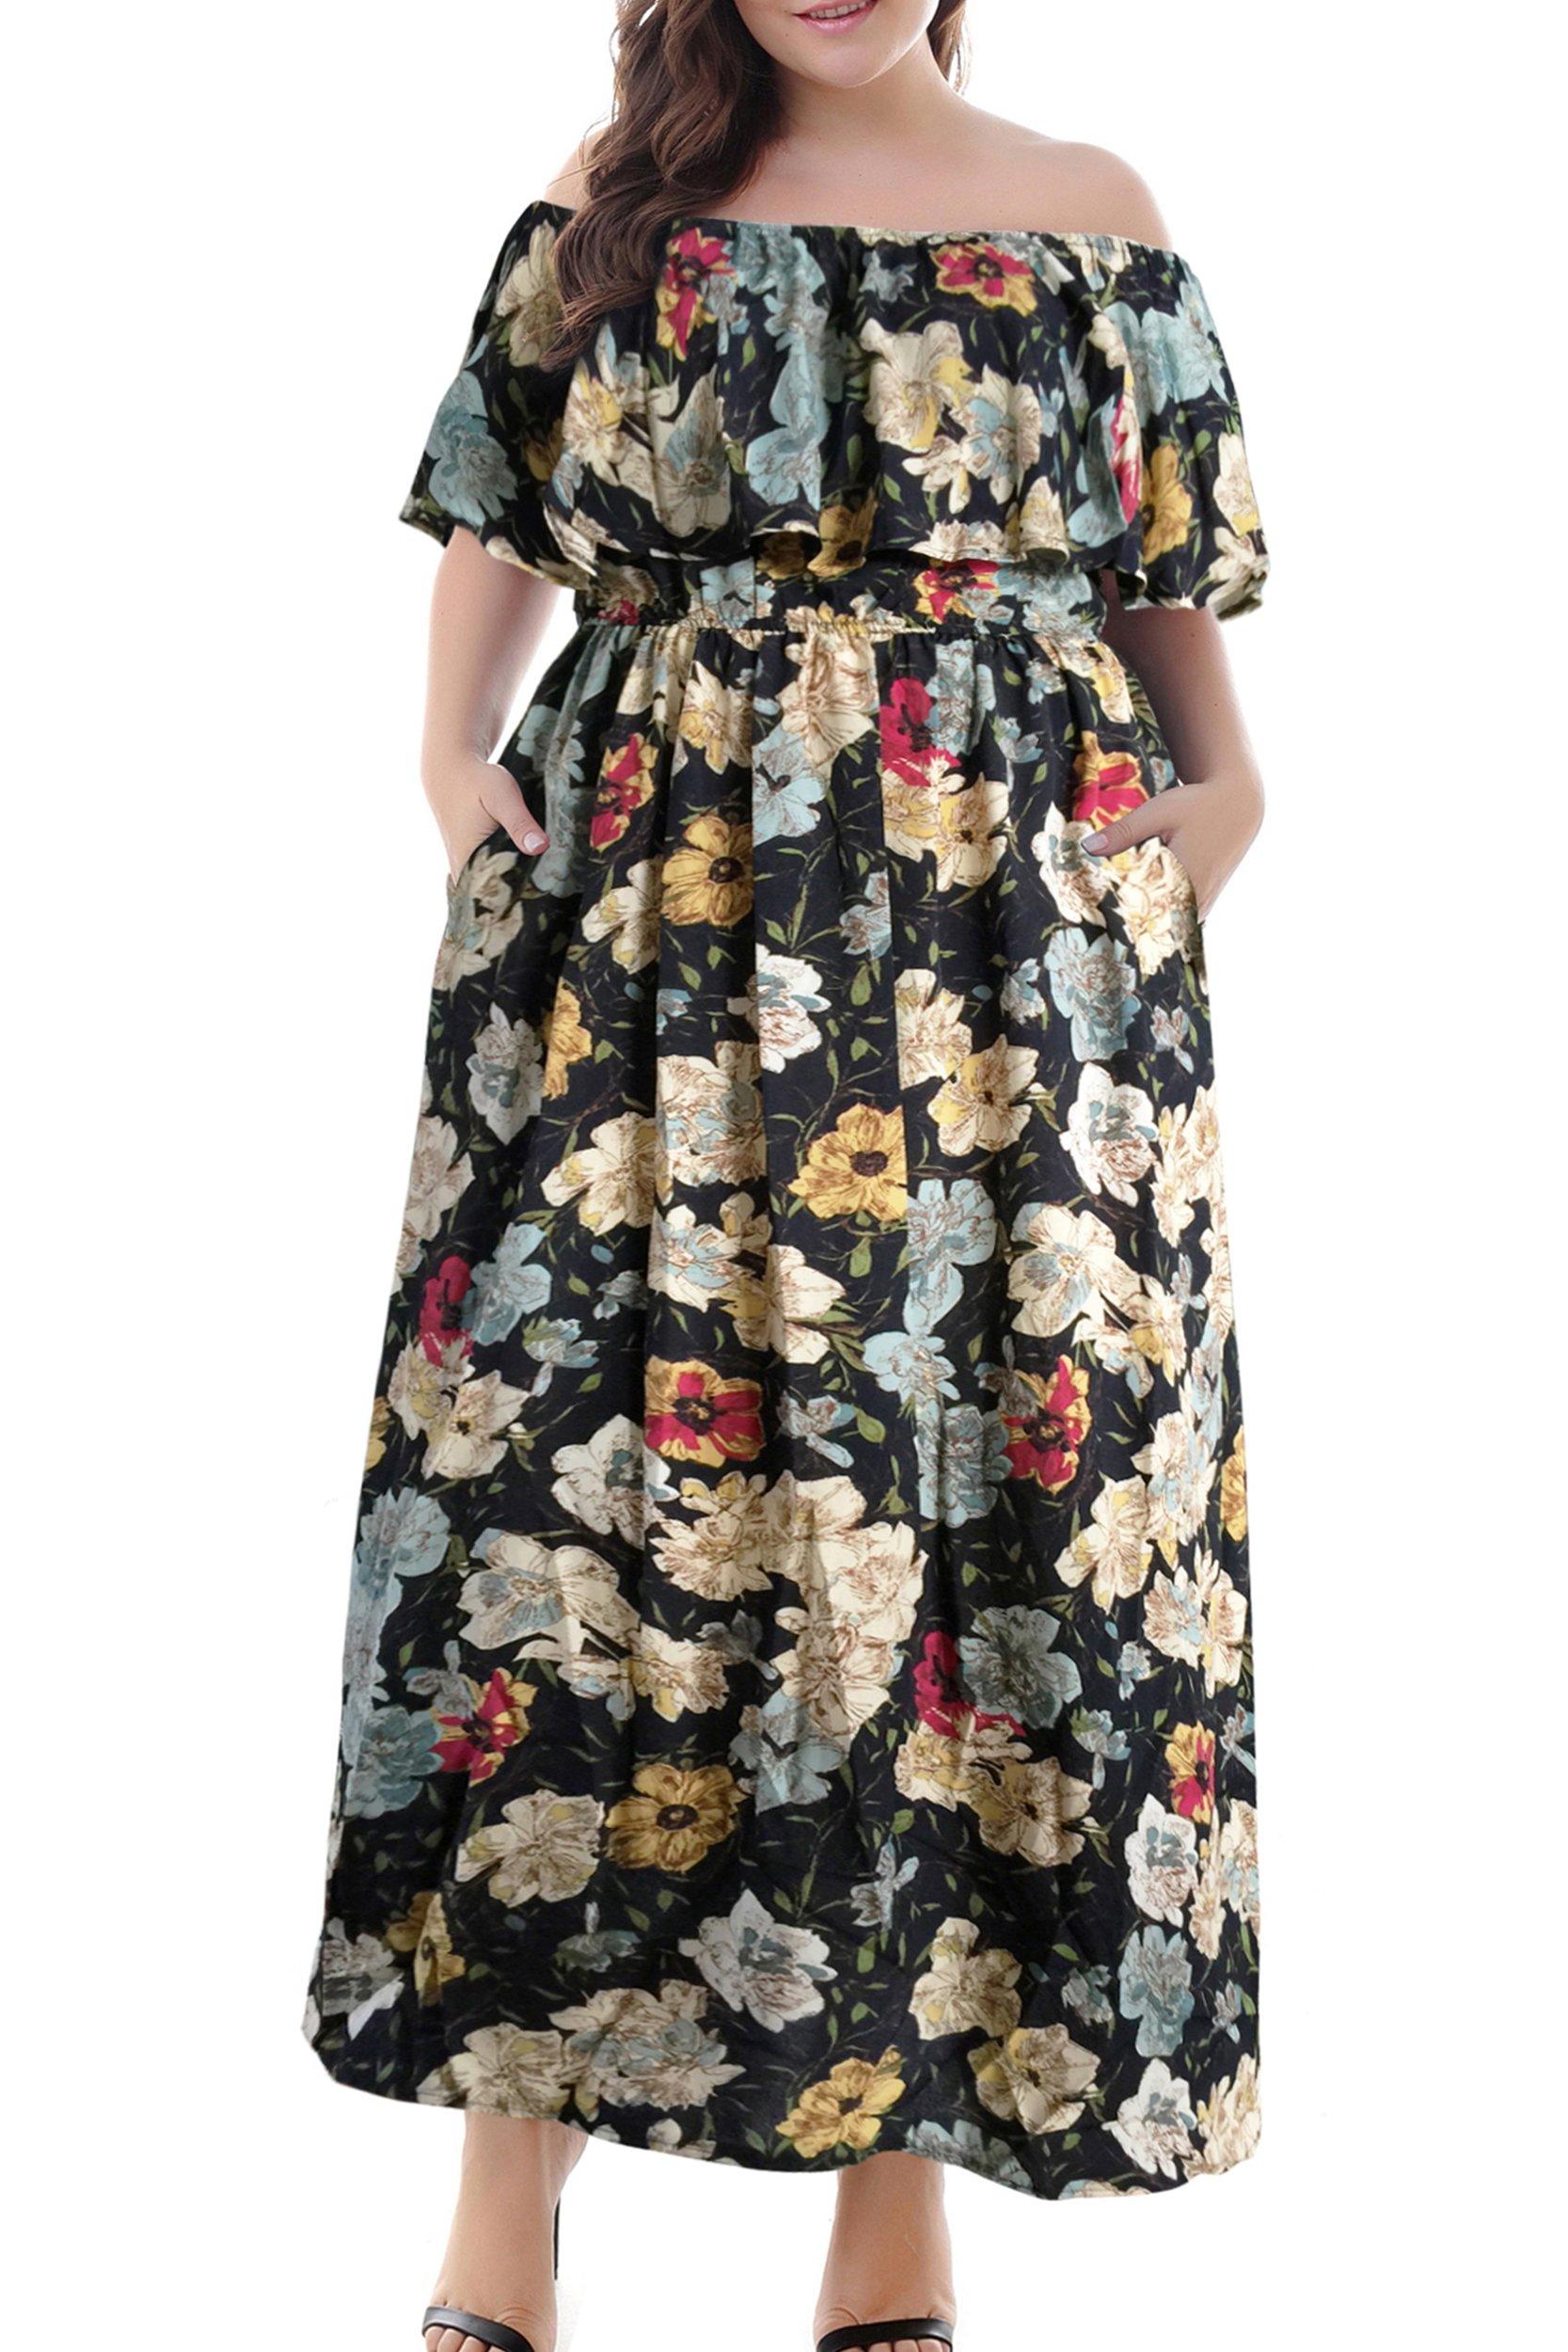 Nemidor Women's Floral Print Off Shoulder Summer Casual Plus Size Maxi Dress with Pocket (Yellow+Print, 22W)